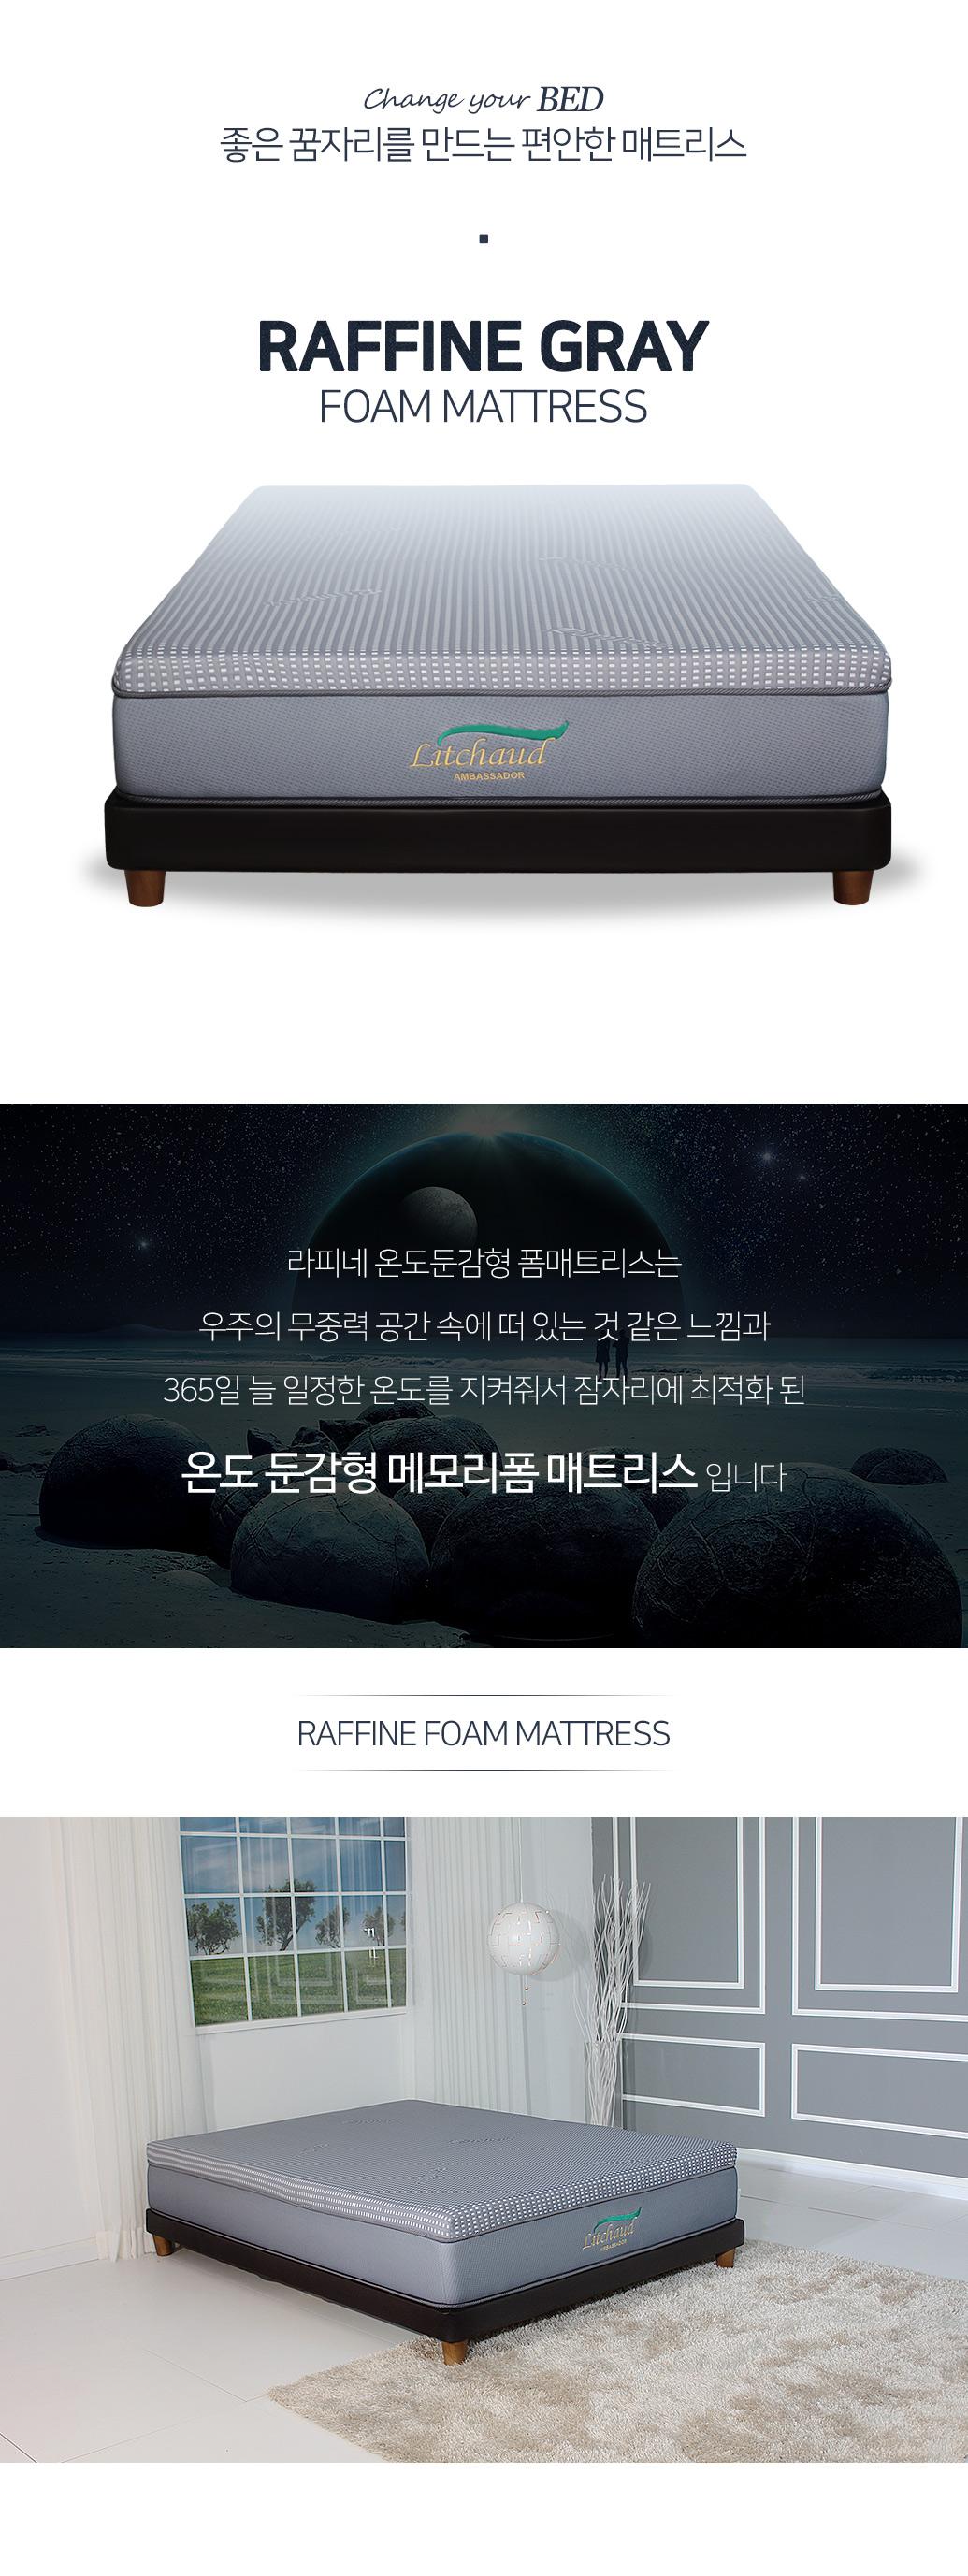 raffine_gray02.jpg